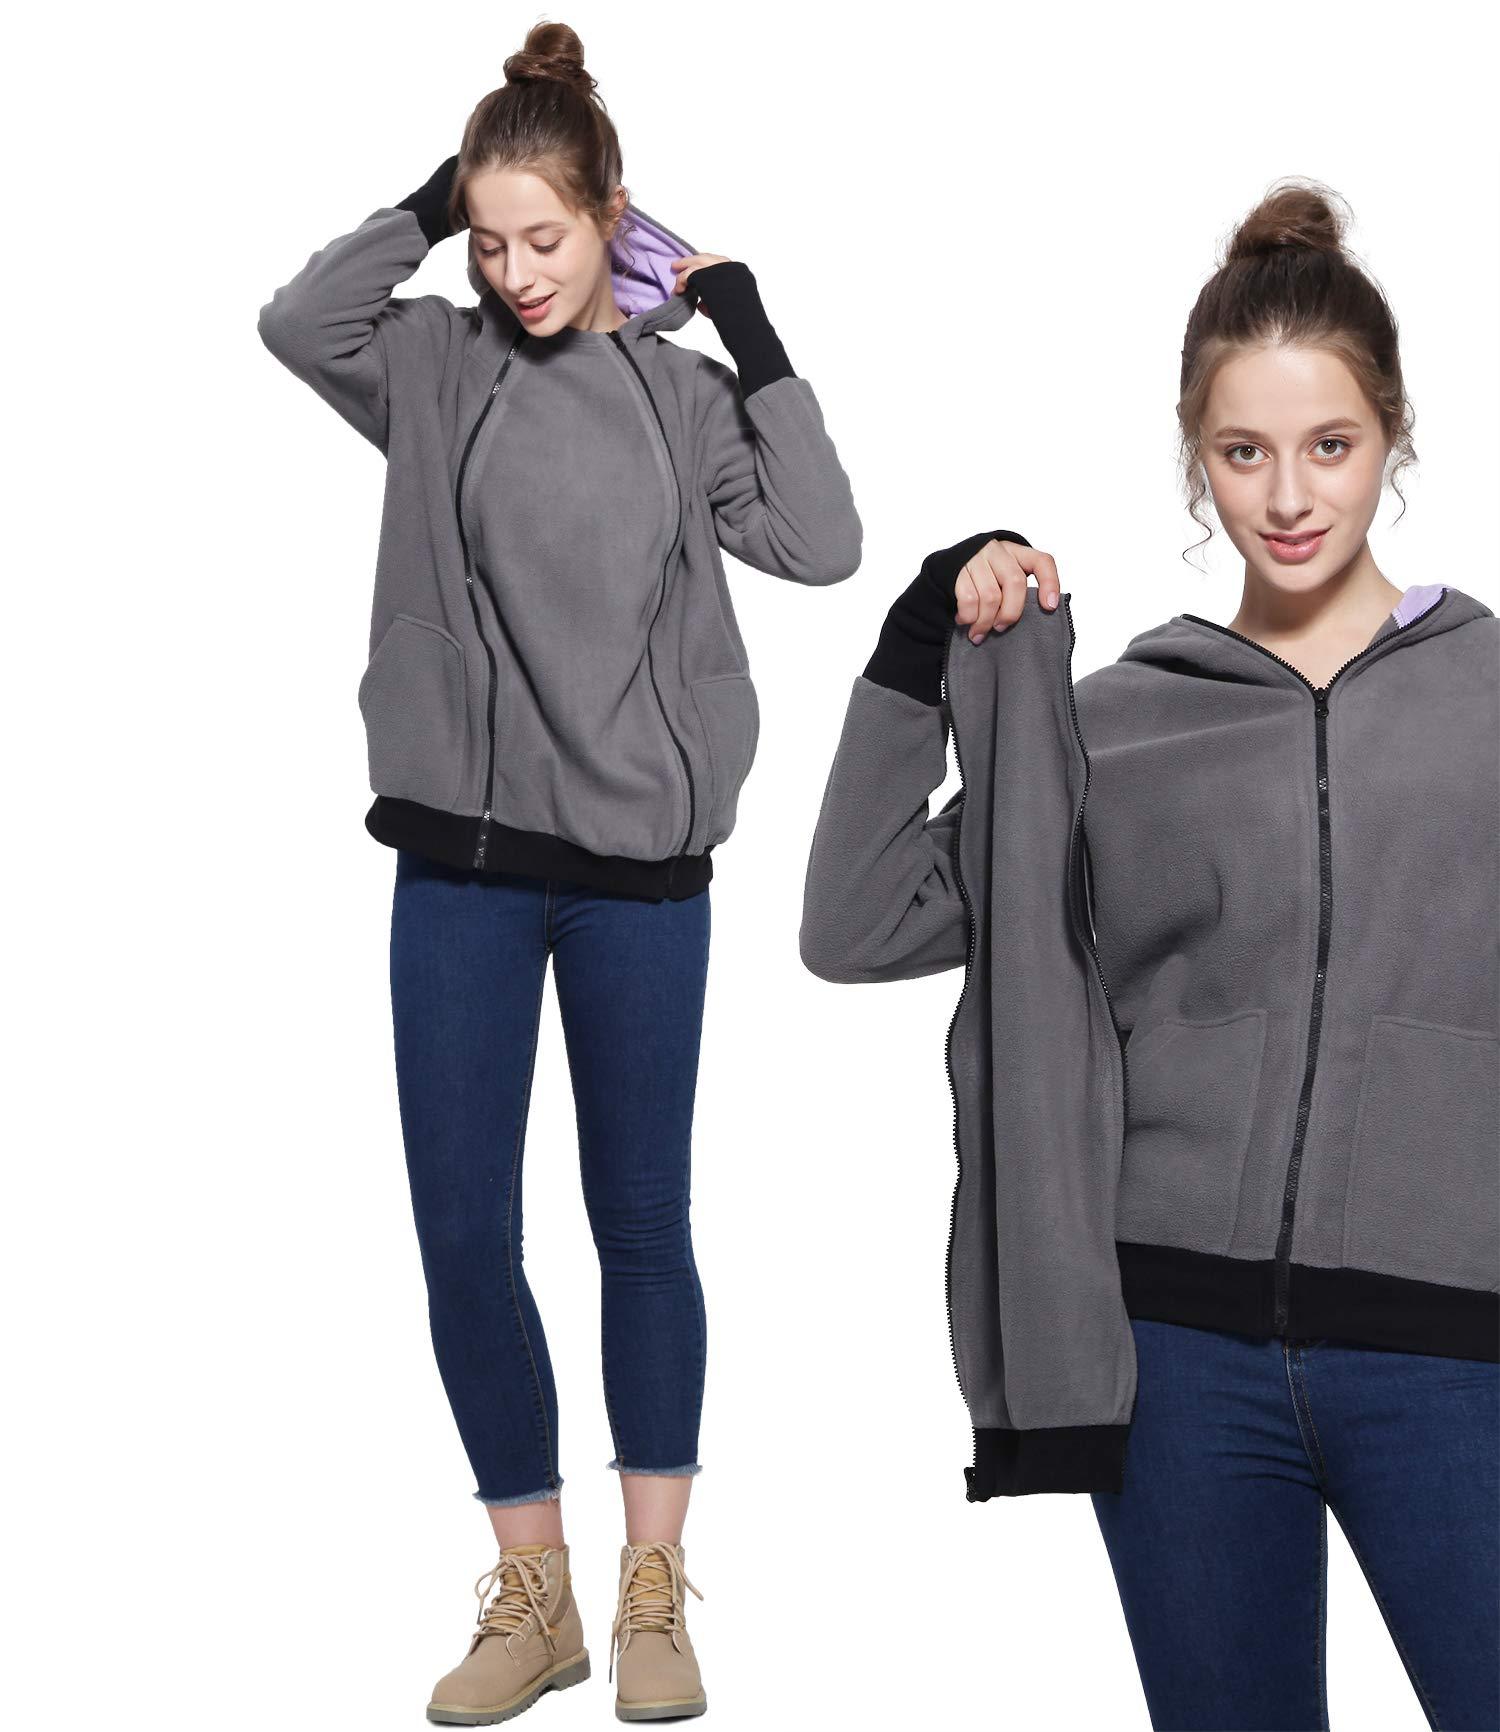 Womens Maternity Hoodie Polar Fleece Sweatshirt, 2 in1 Soft Zipper Up Jacket for Mom (Dark Gray, S/M)